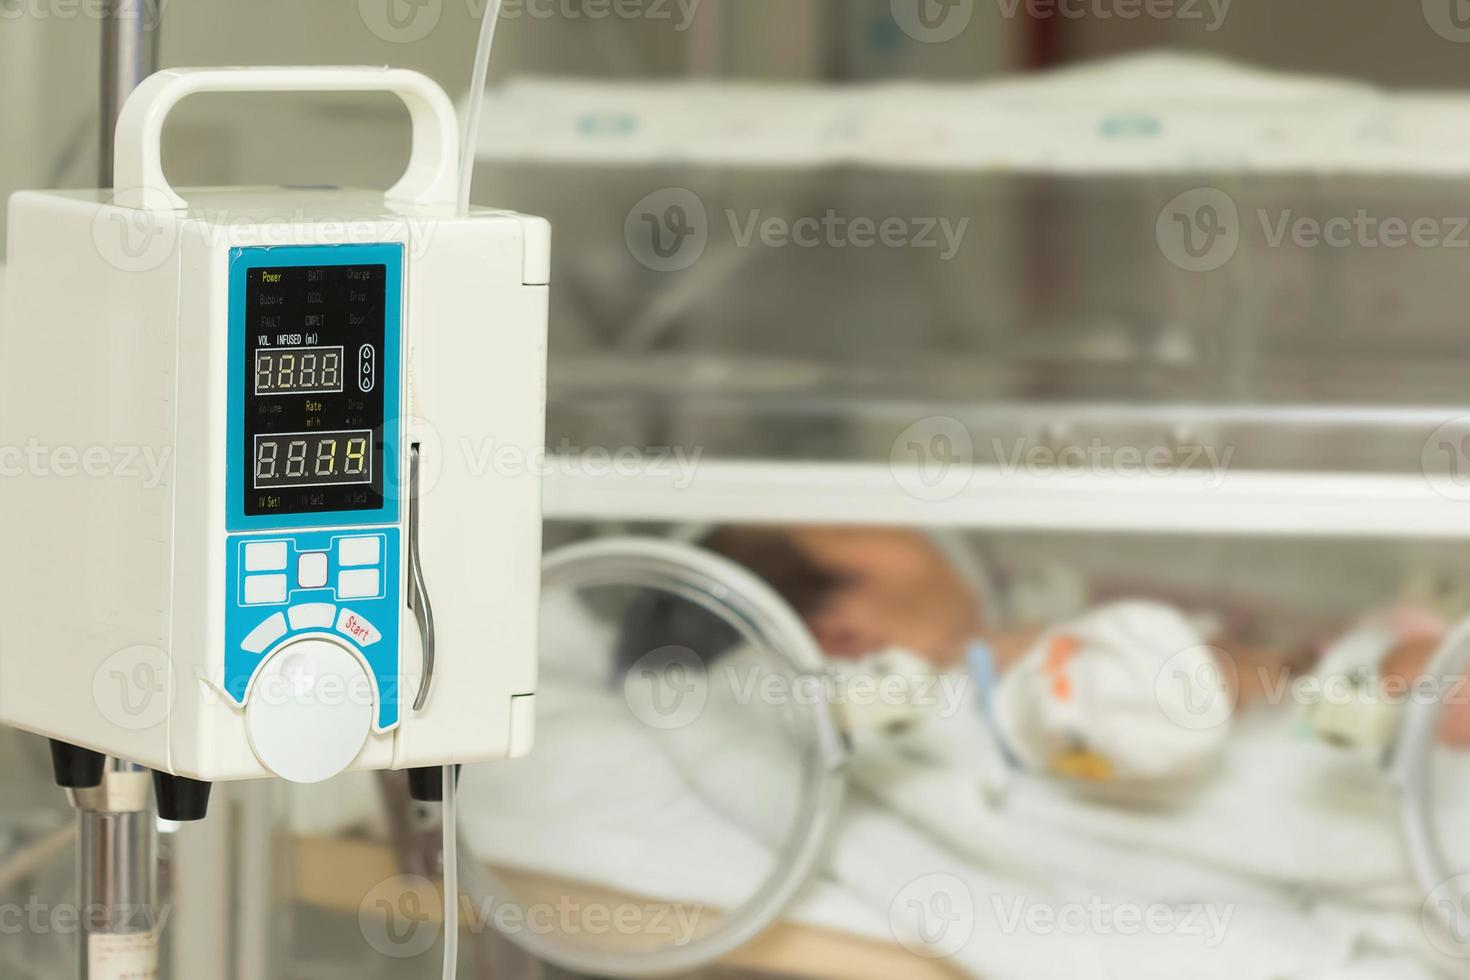 Infusionspumpe, die iv füttert, tropft in Babys Patienten foto